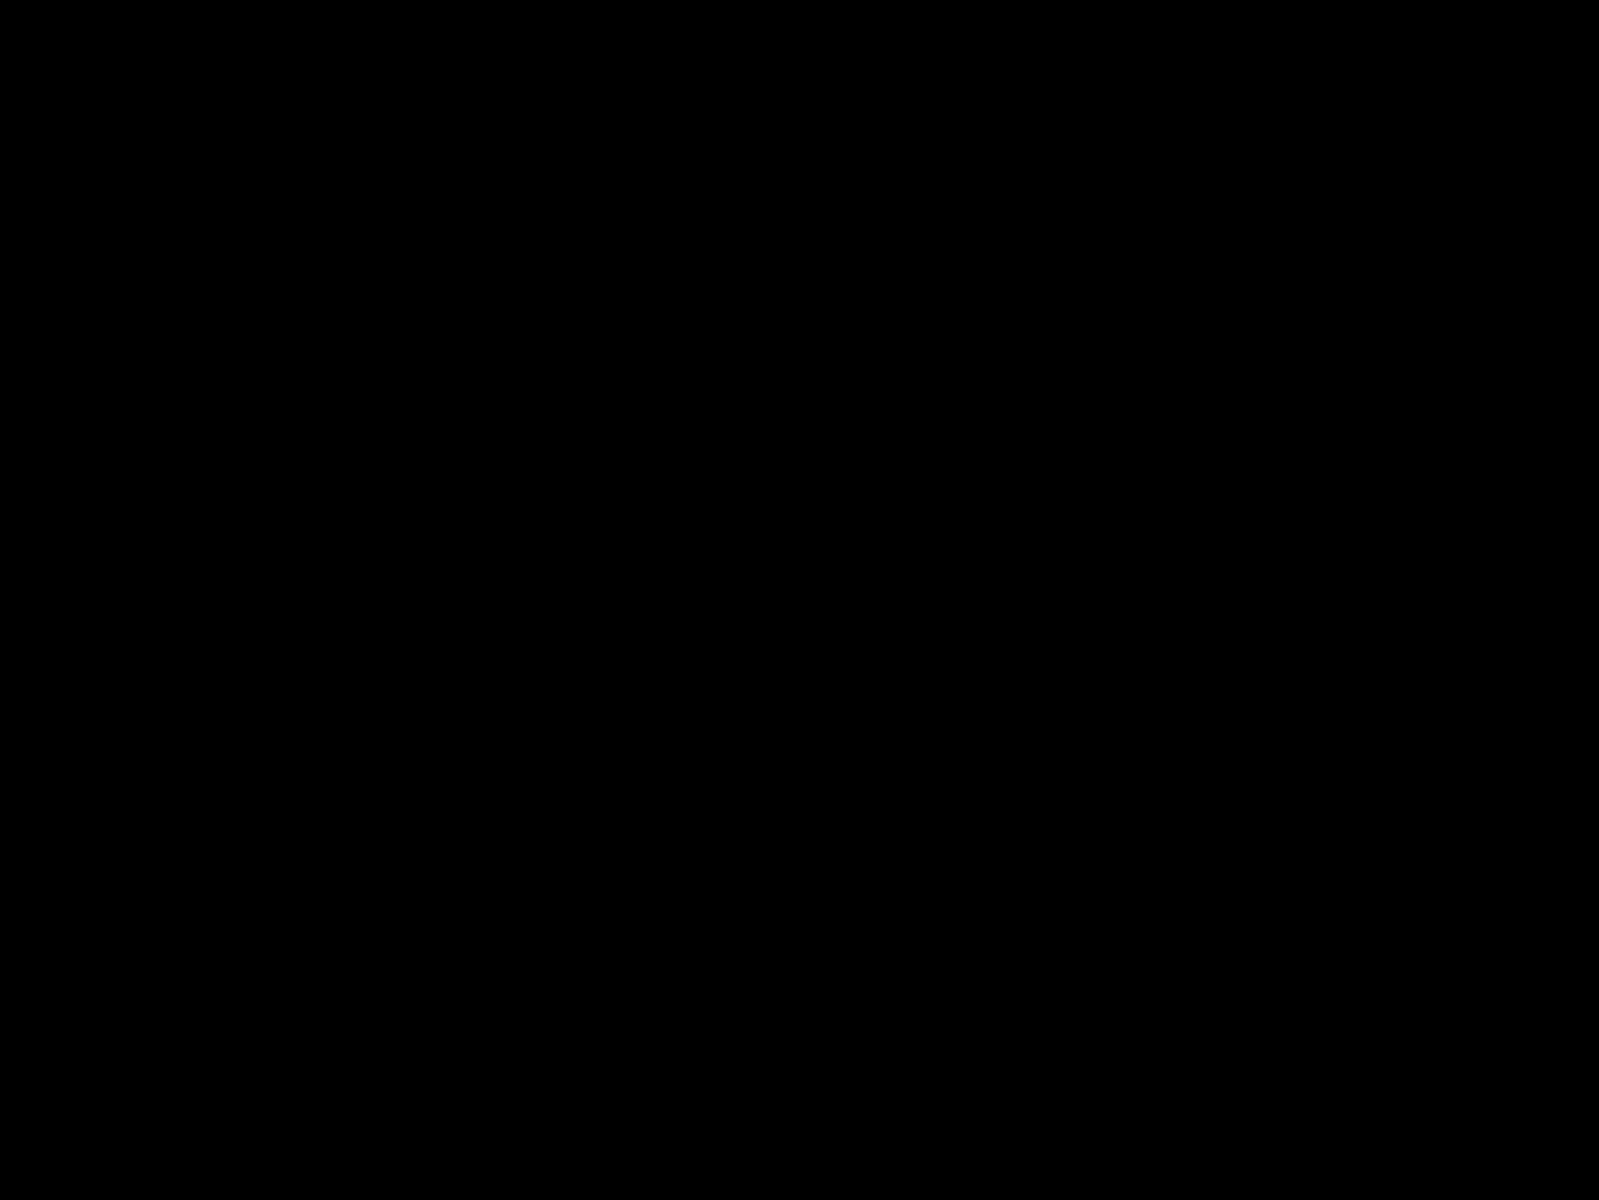 5-rohove-baleni-sklad-rivet-nejlepsi-pro-vas-blog